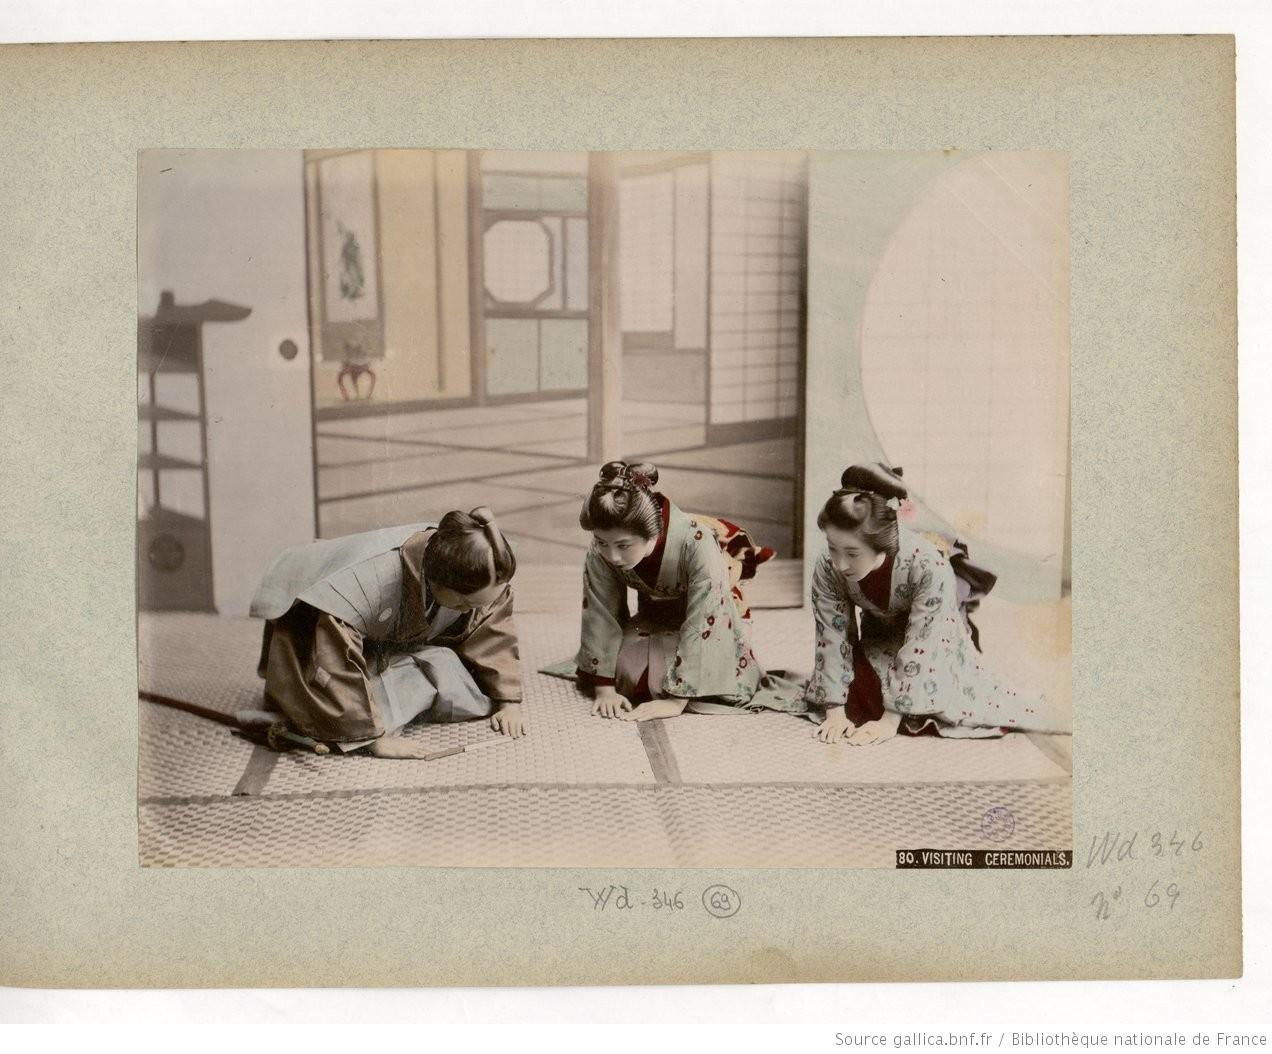 Fig. 69. 80. Visiting ceremonials[sic] / Kinbei Kusakabe;